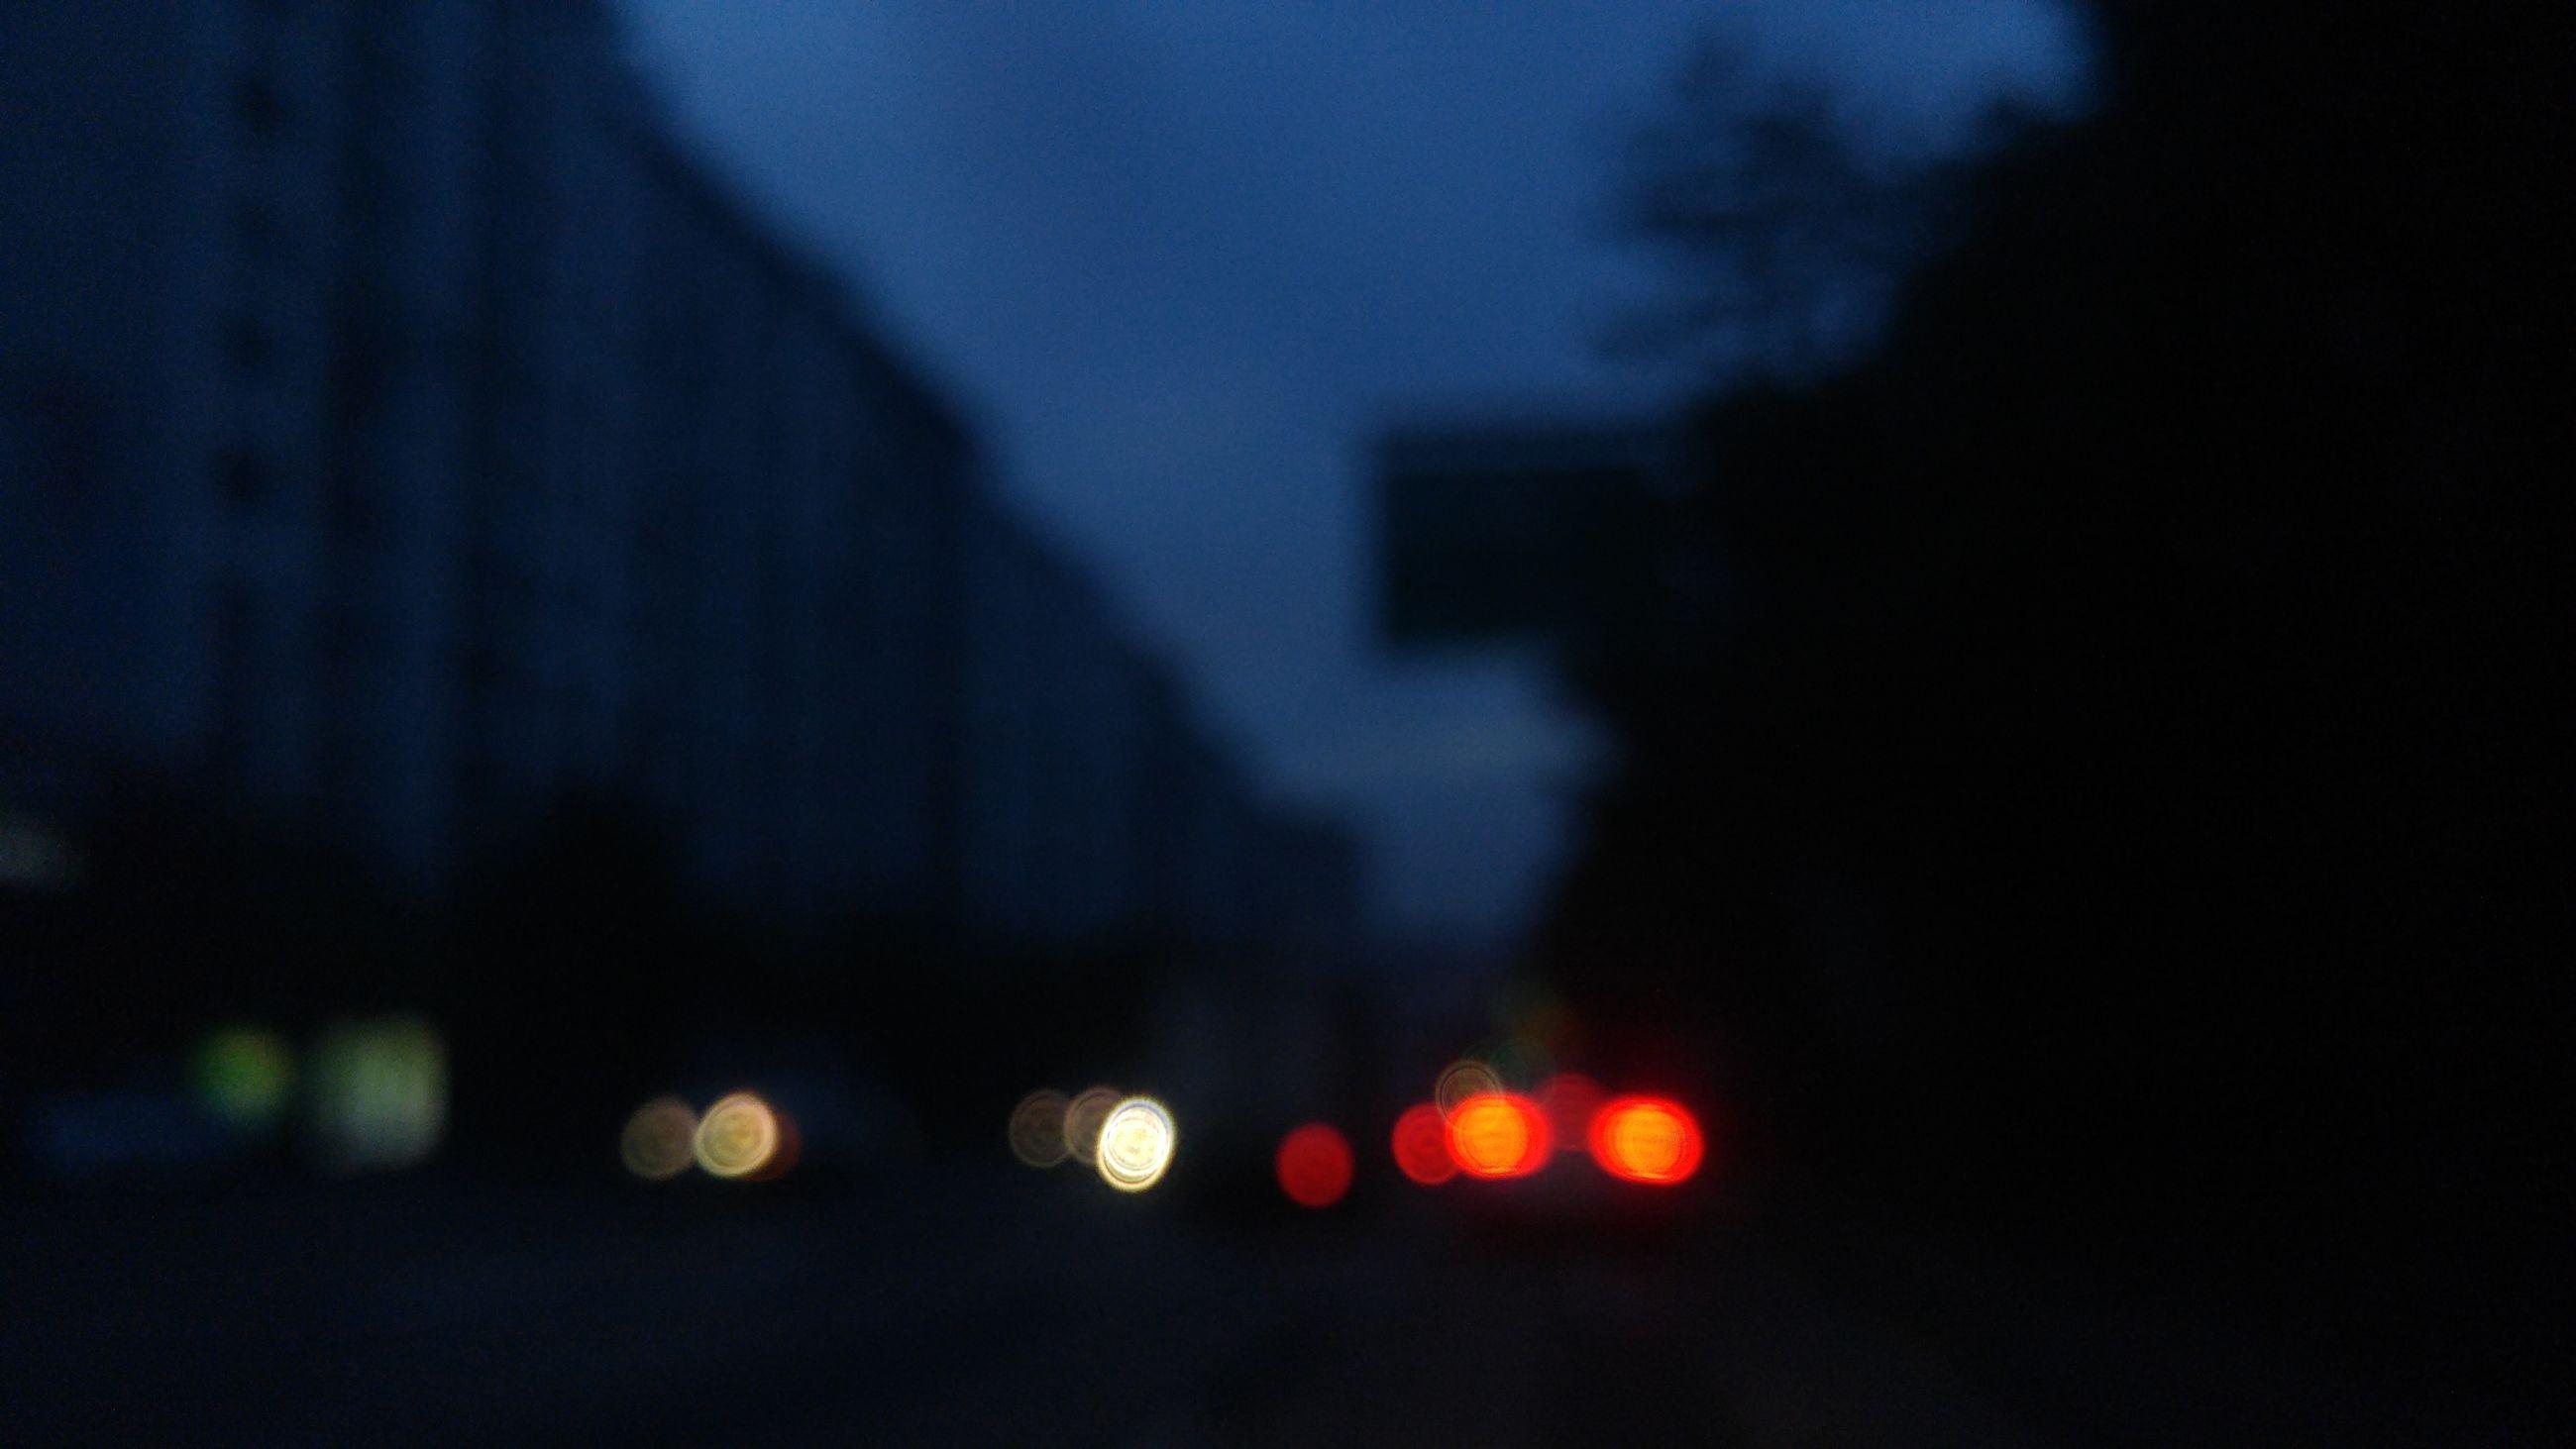 illuminated, night, defocused, dark, light - natural phenomenon, lighting equipment, glowing, street, sunset, sky, no people, city, silhouette, outdoors, street light, lens flare, car, light, road, dusk